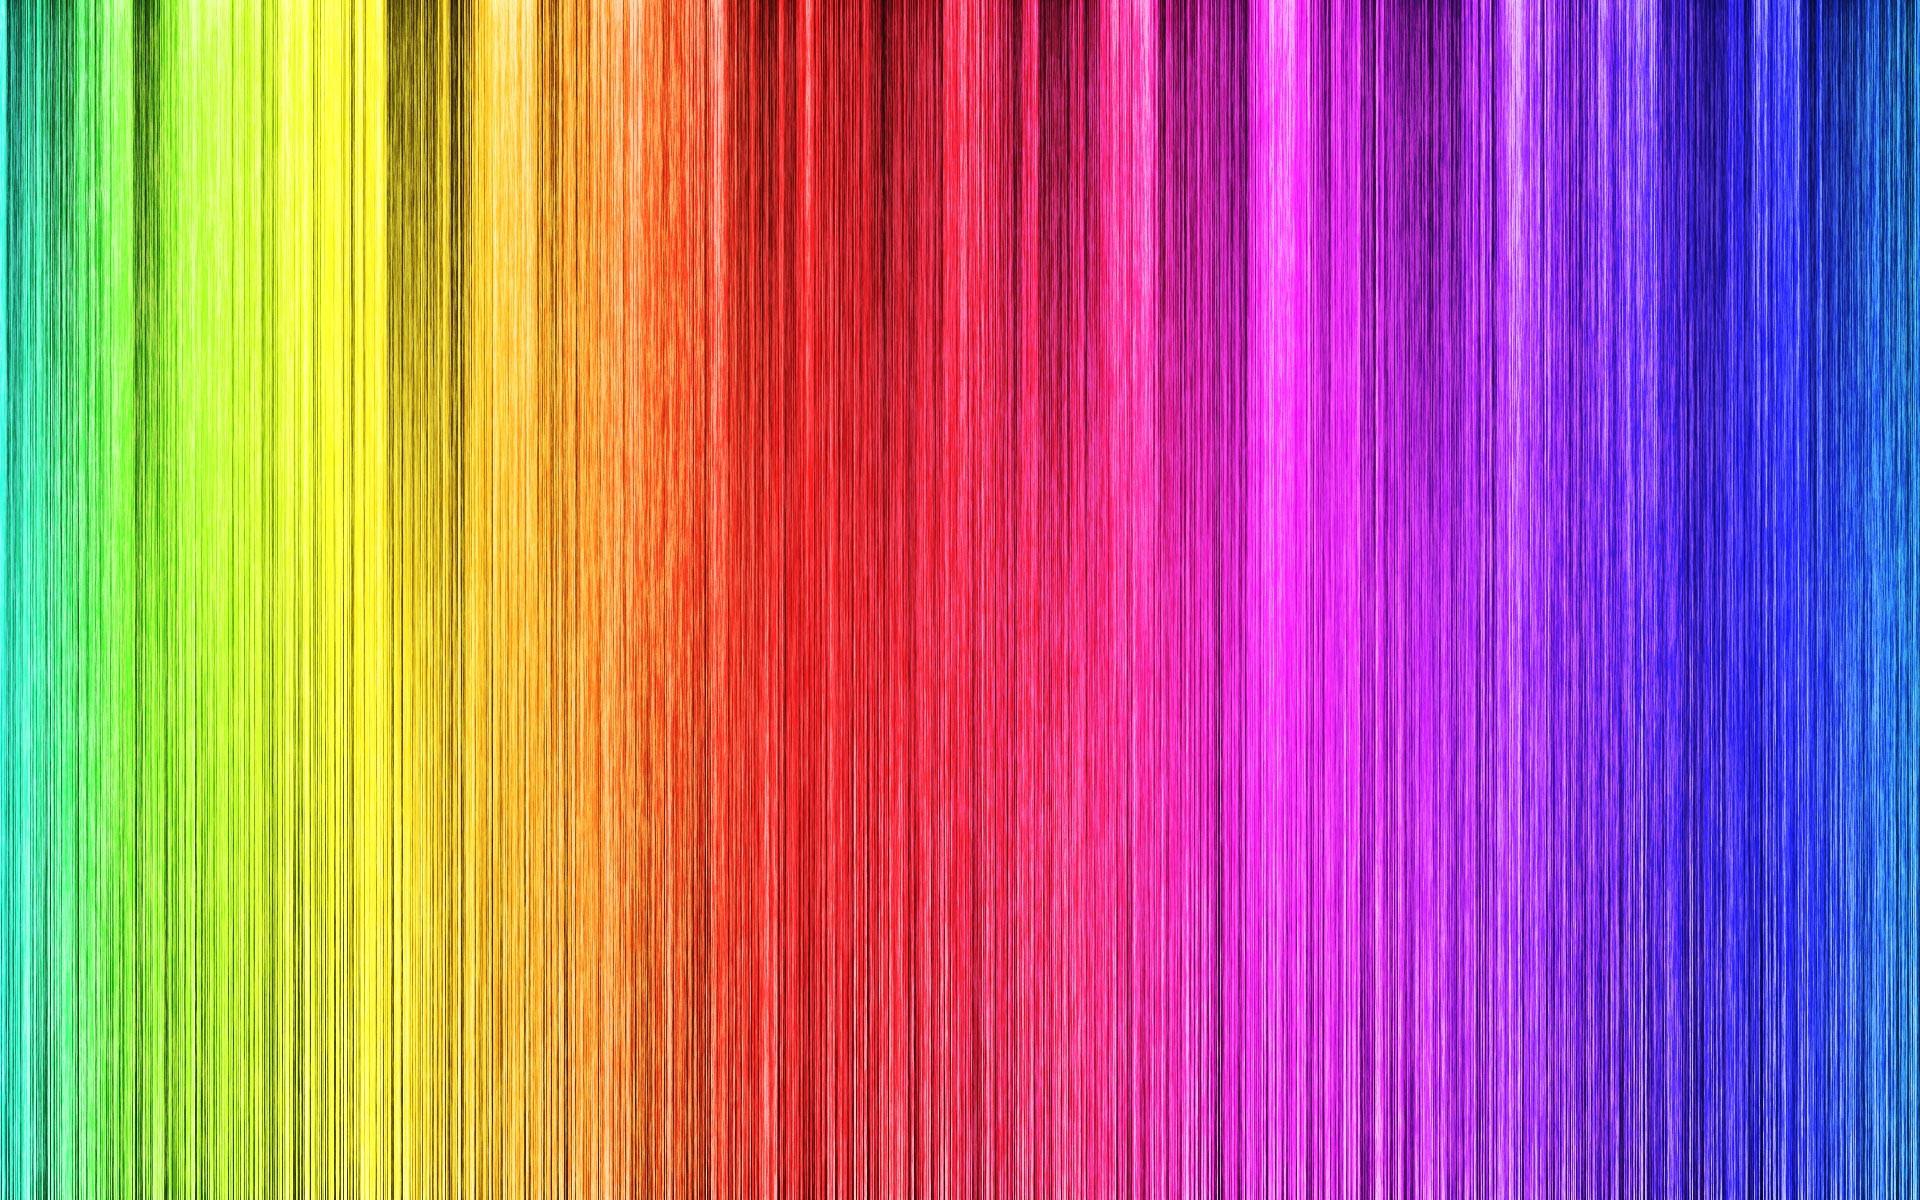 Rainbow Backgrounds wallpaper